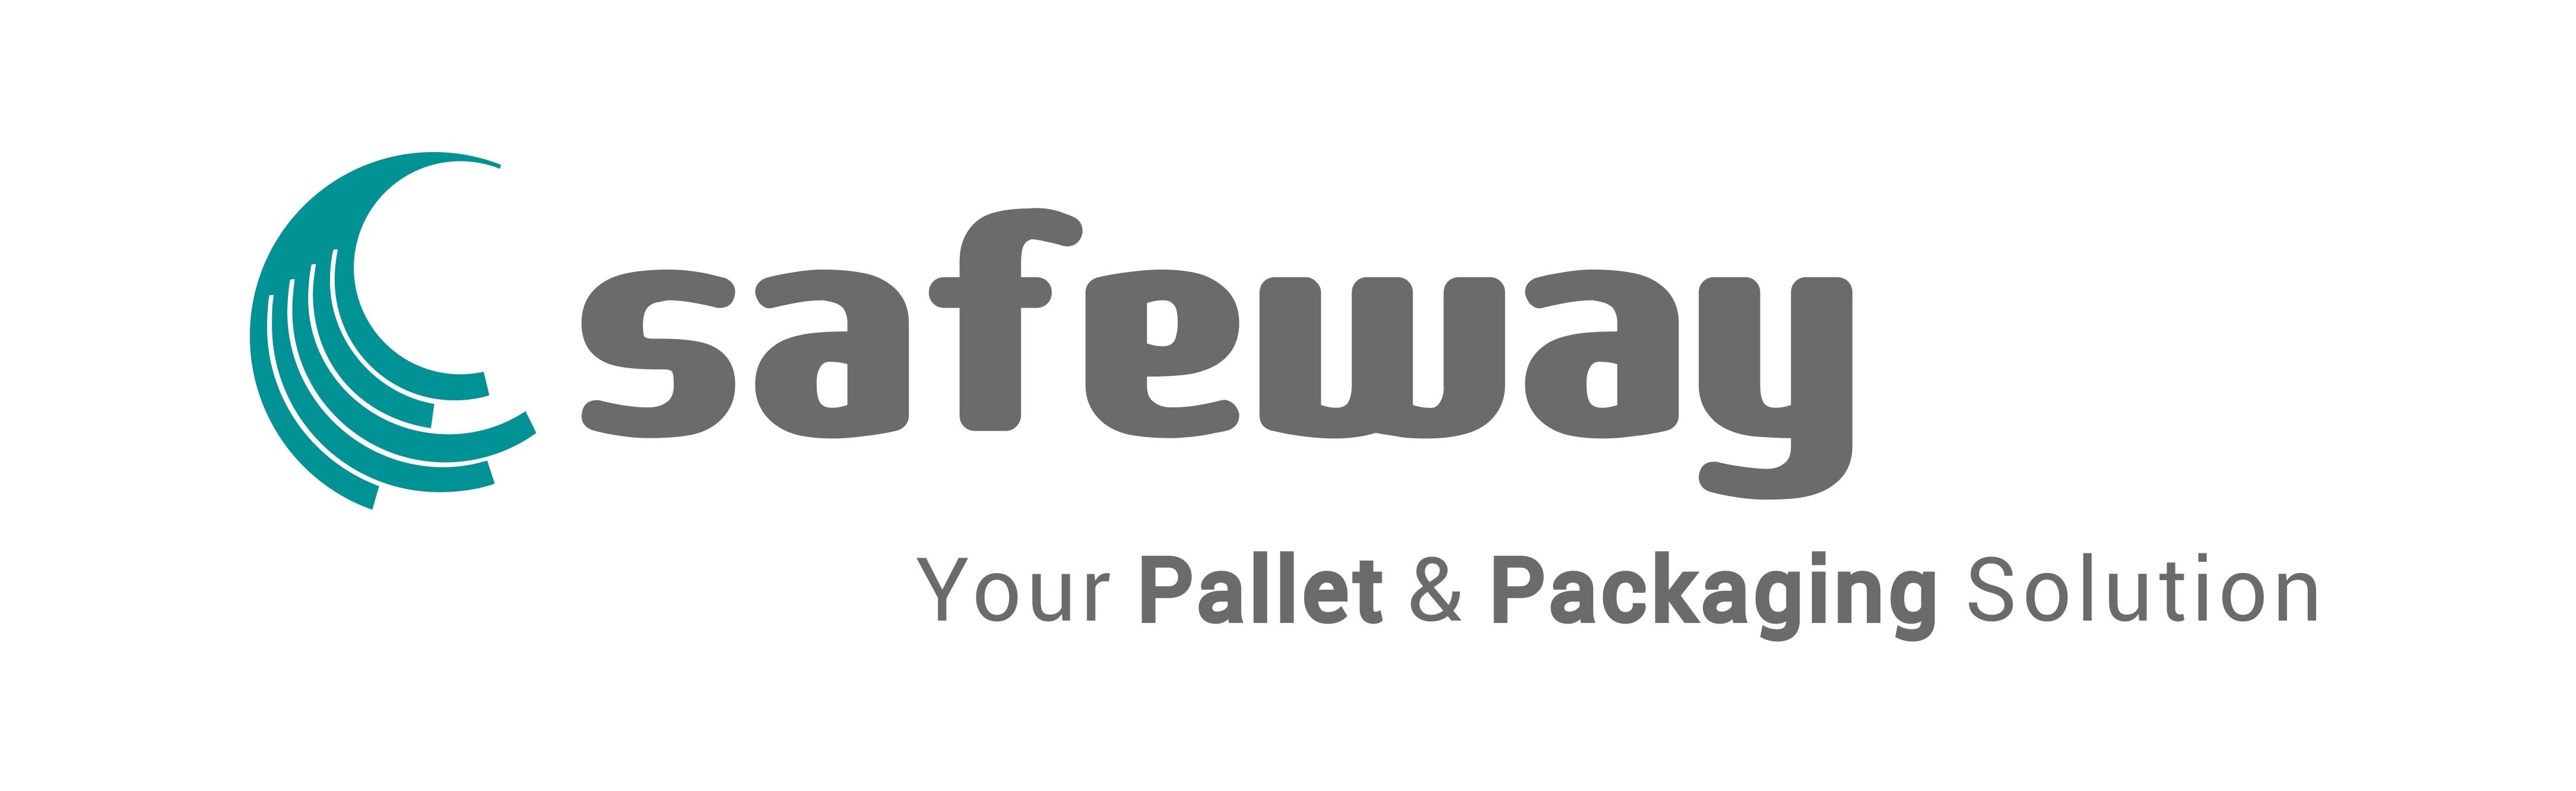 Logo safeway